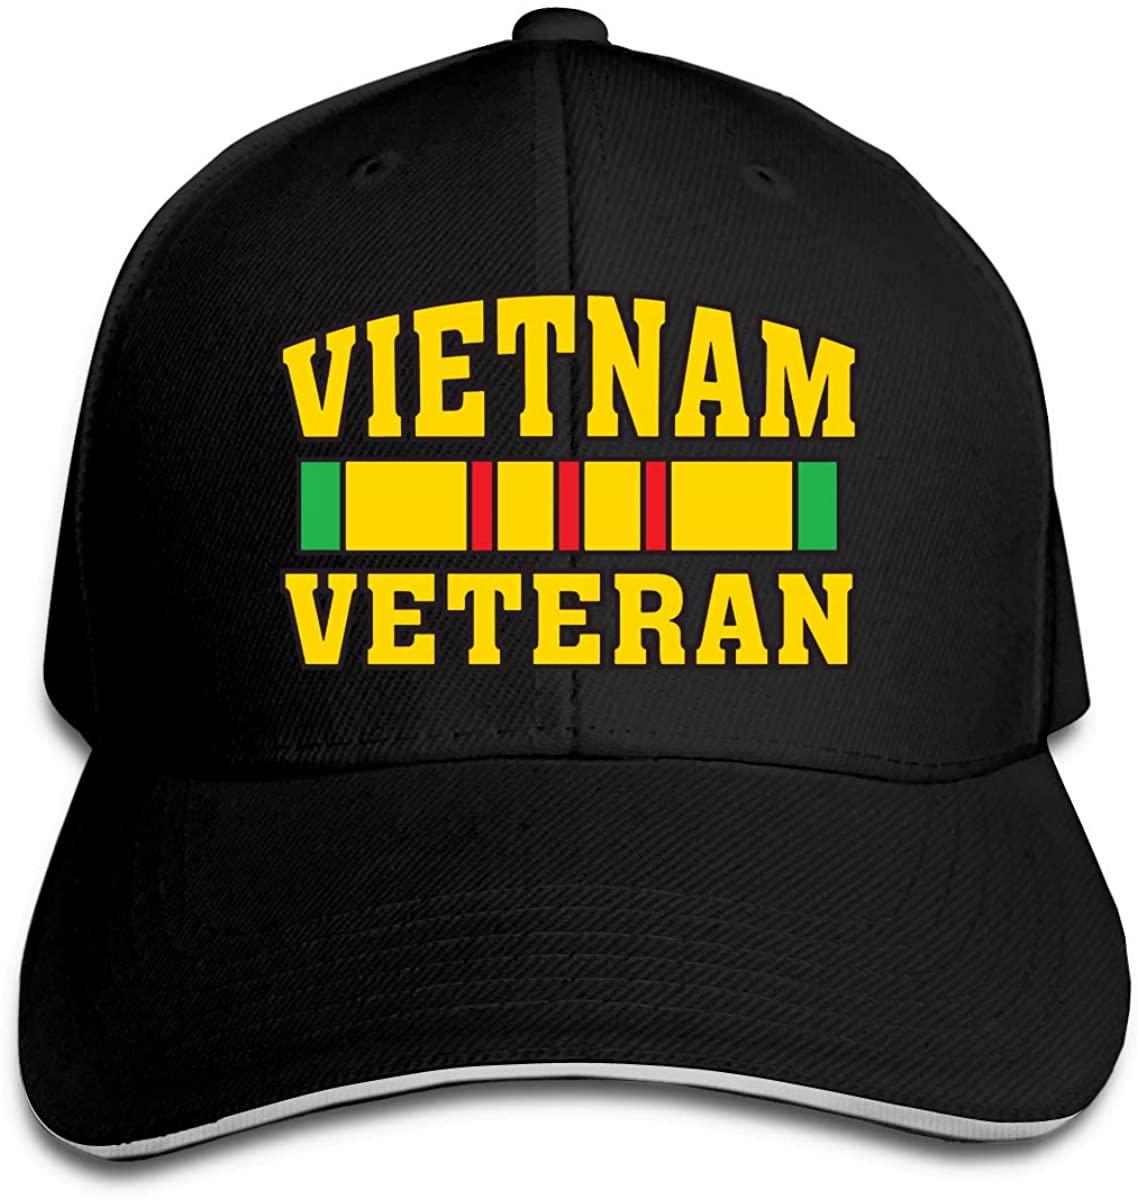 Vietnam Veteran Unisex Sandwich Baseball Cap Adjustable Snapback Hat Hunting Casquette